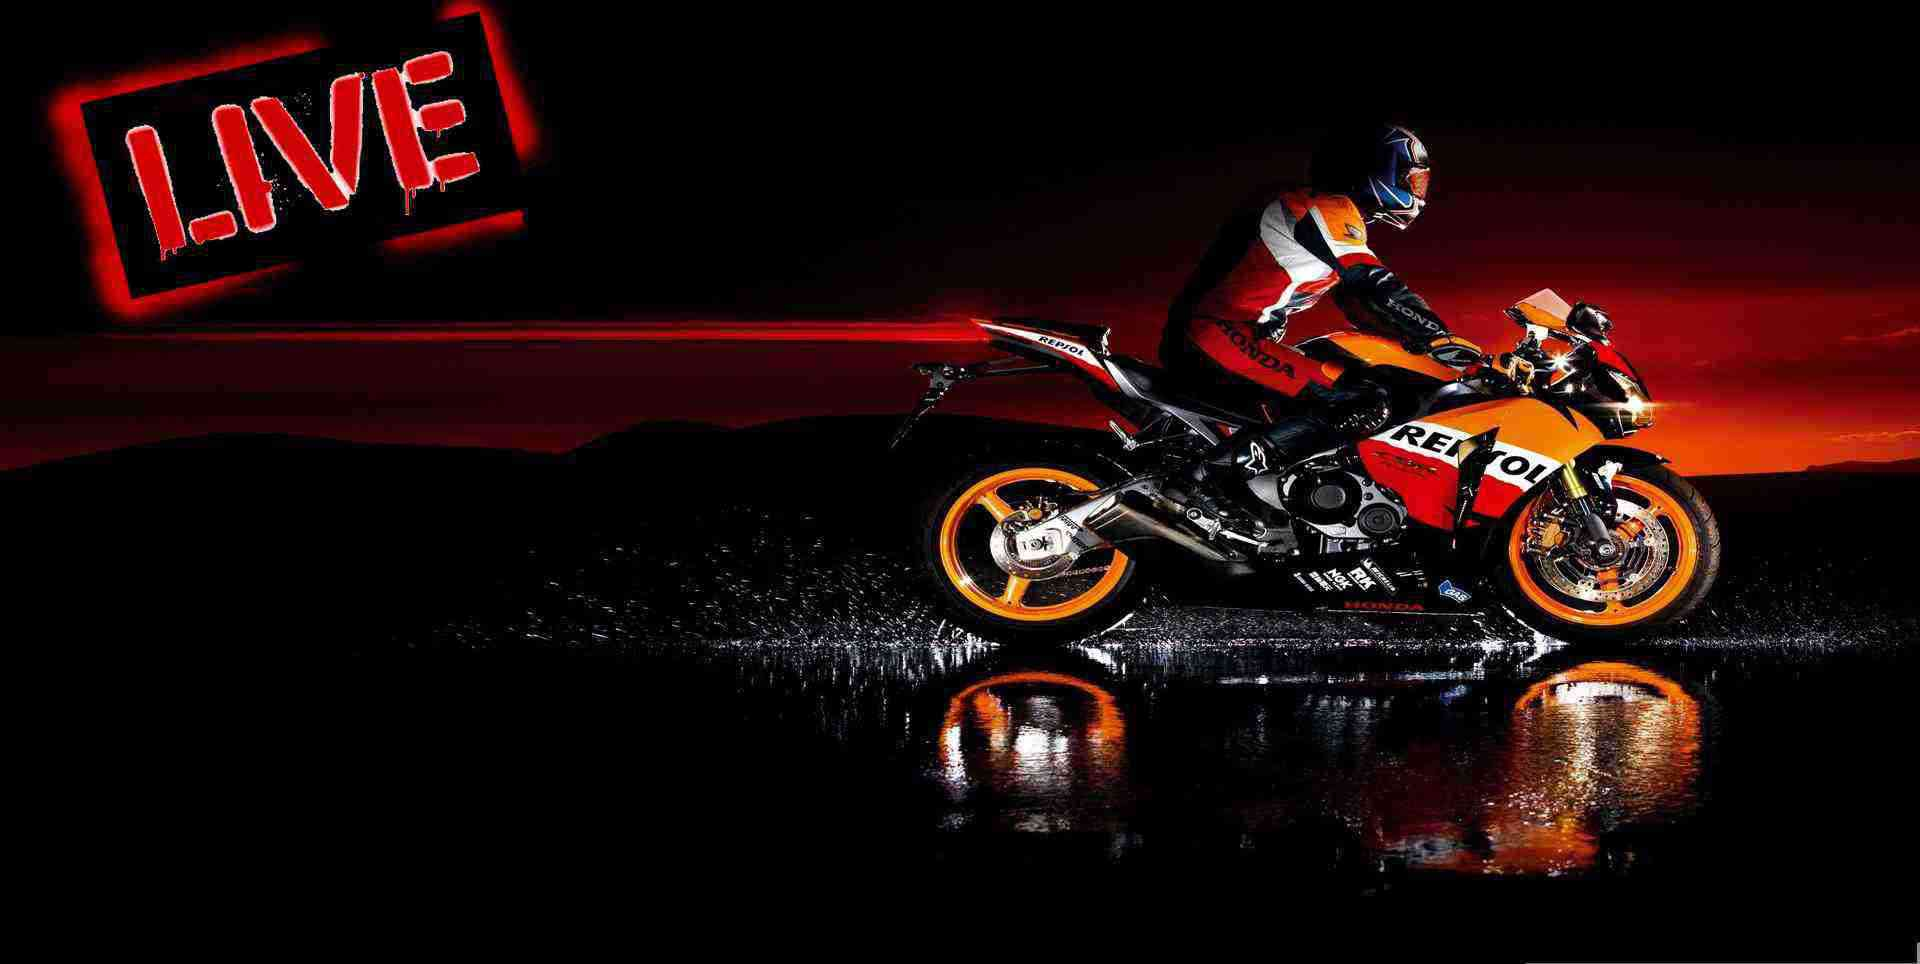 Motogp Race Japan 2015 Online